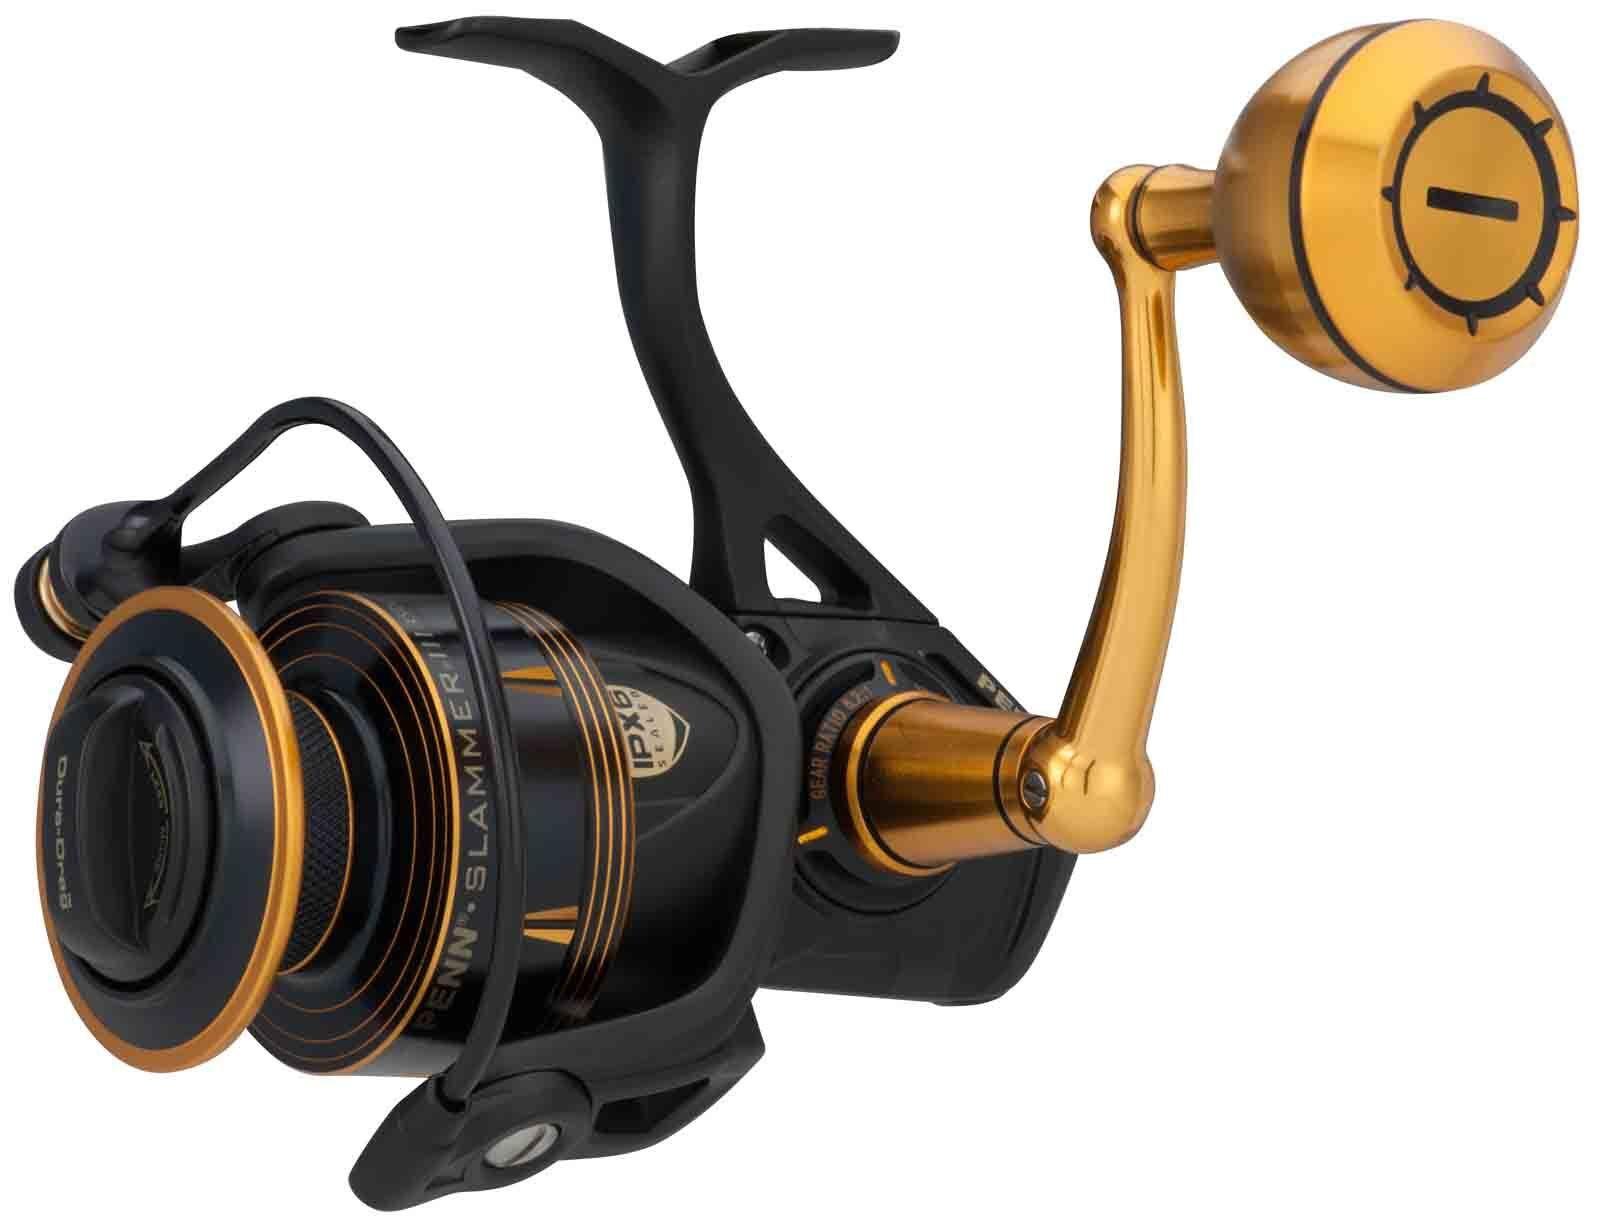 Penn Slammer III MK3 Nuevo Carrete Fijo Spin Spinning Reel De Pesca-Todos Los Modelos